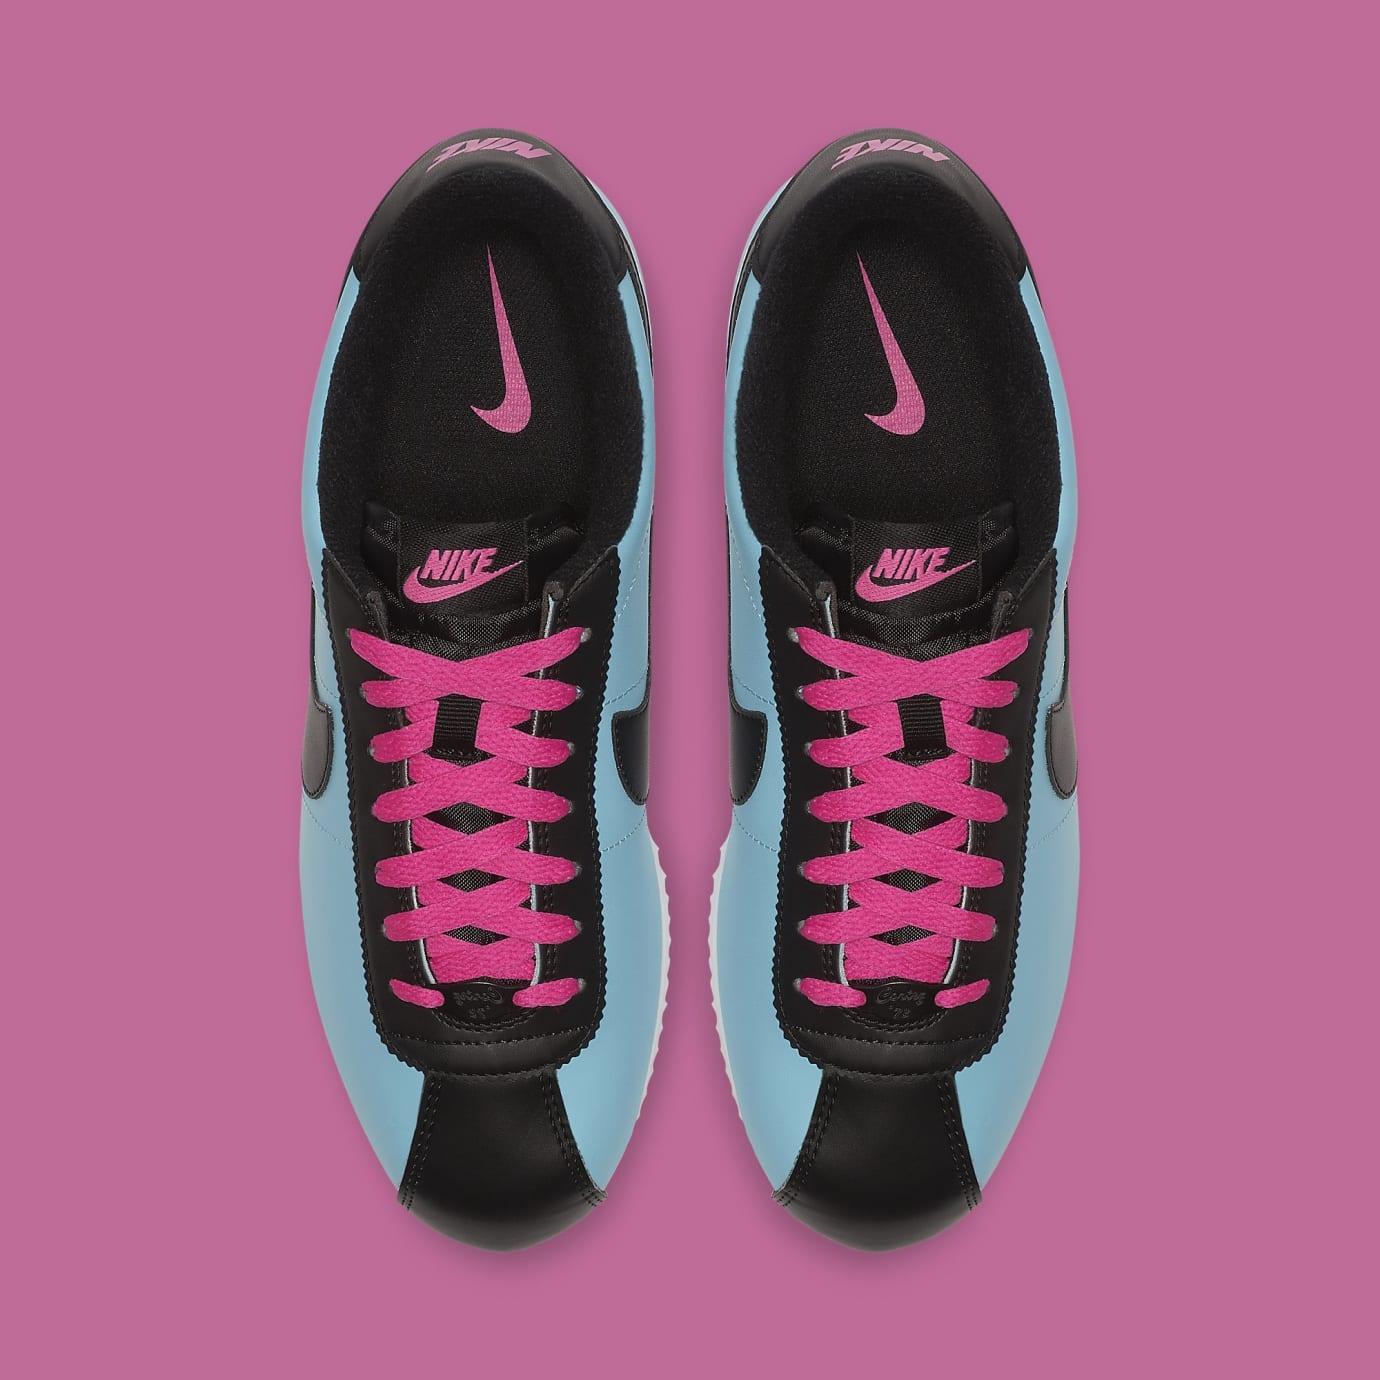 Nike Cortez 'South Beach' BV2527-400 (Top)